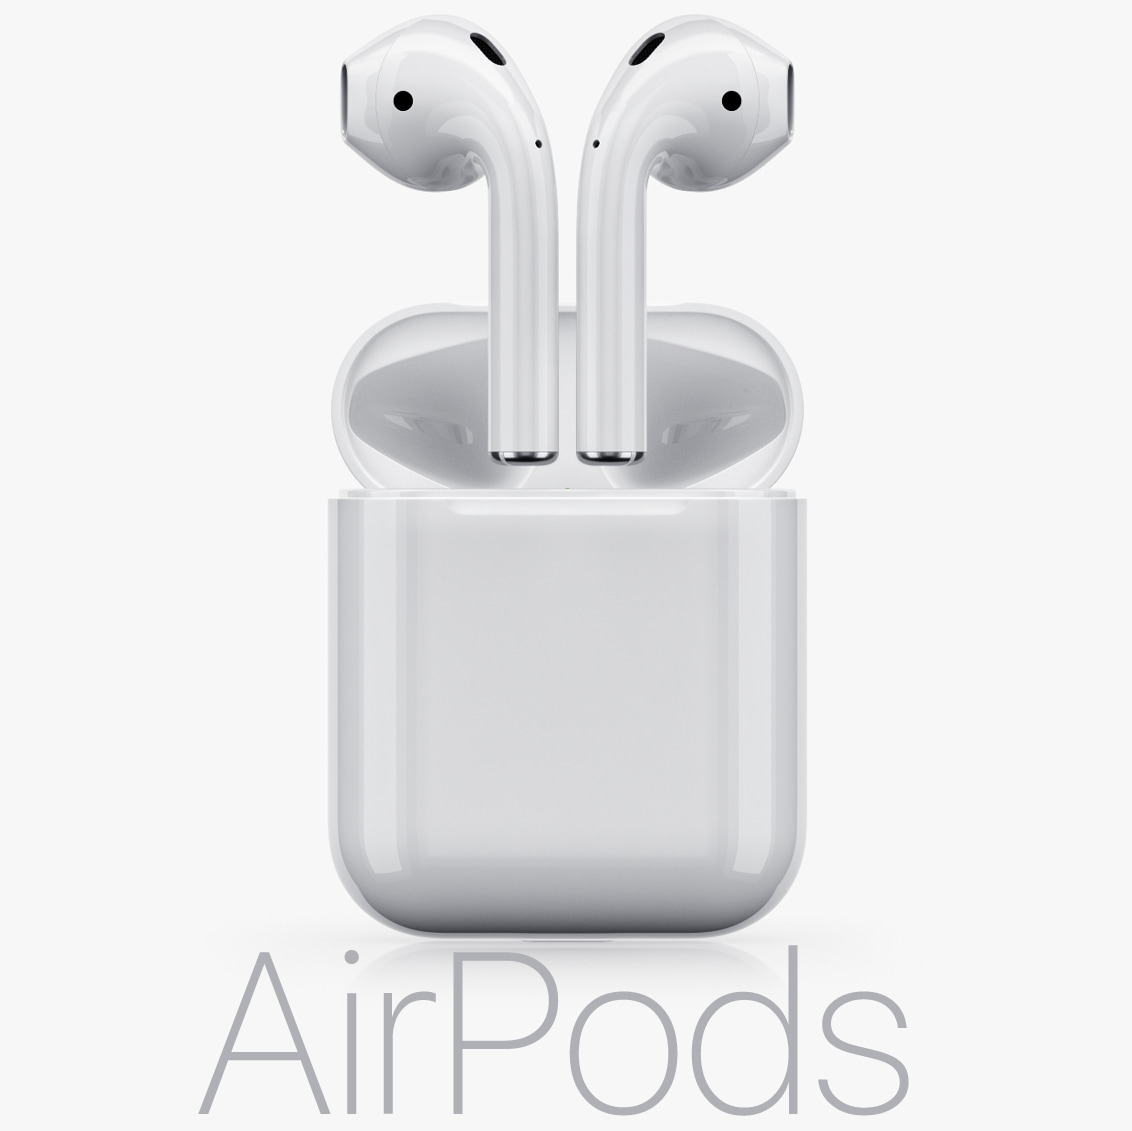 AirPods_00.jpg